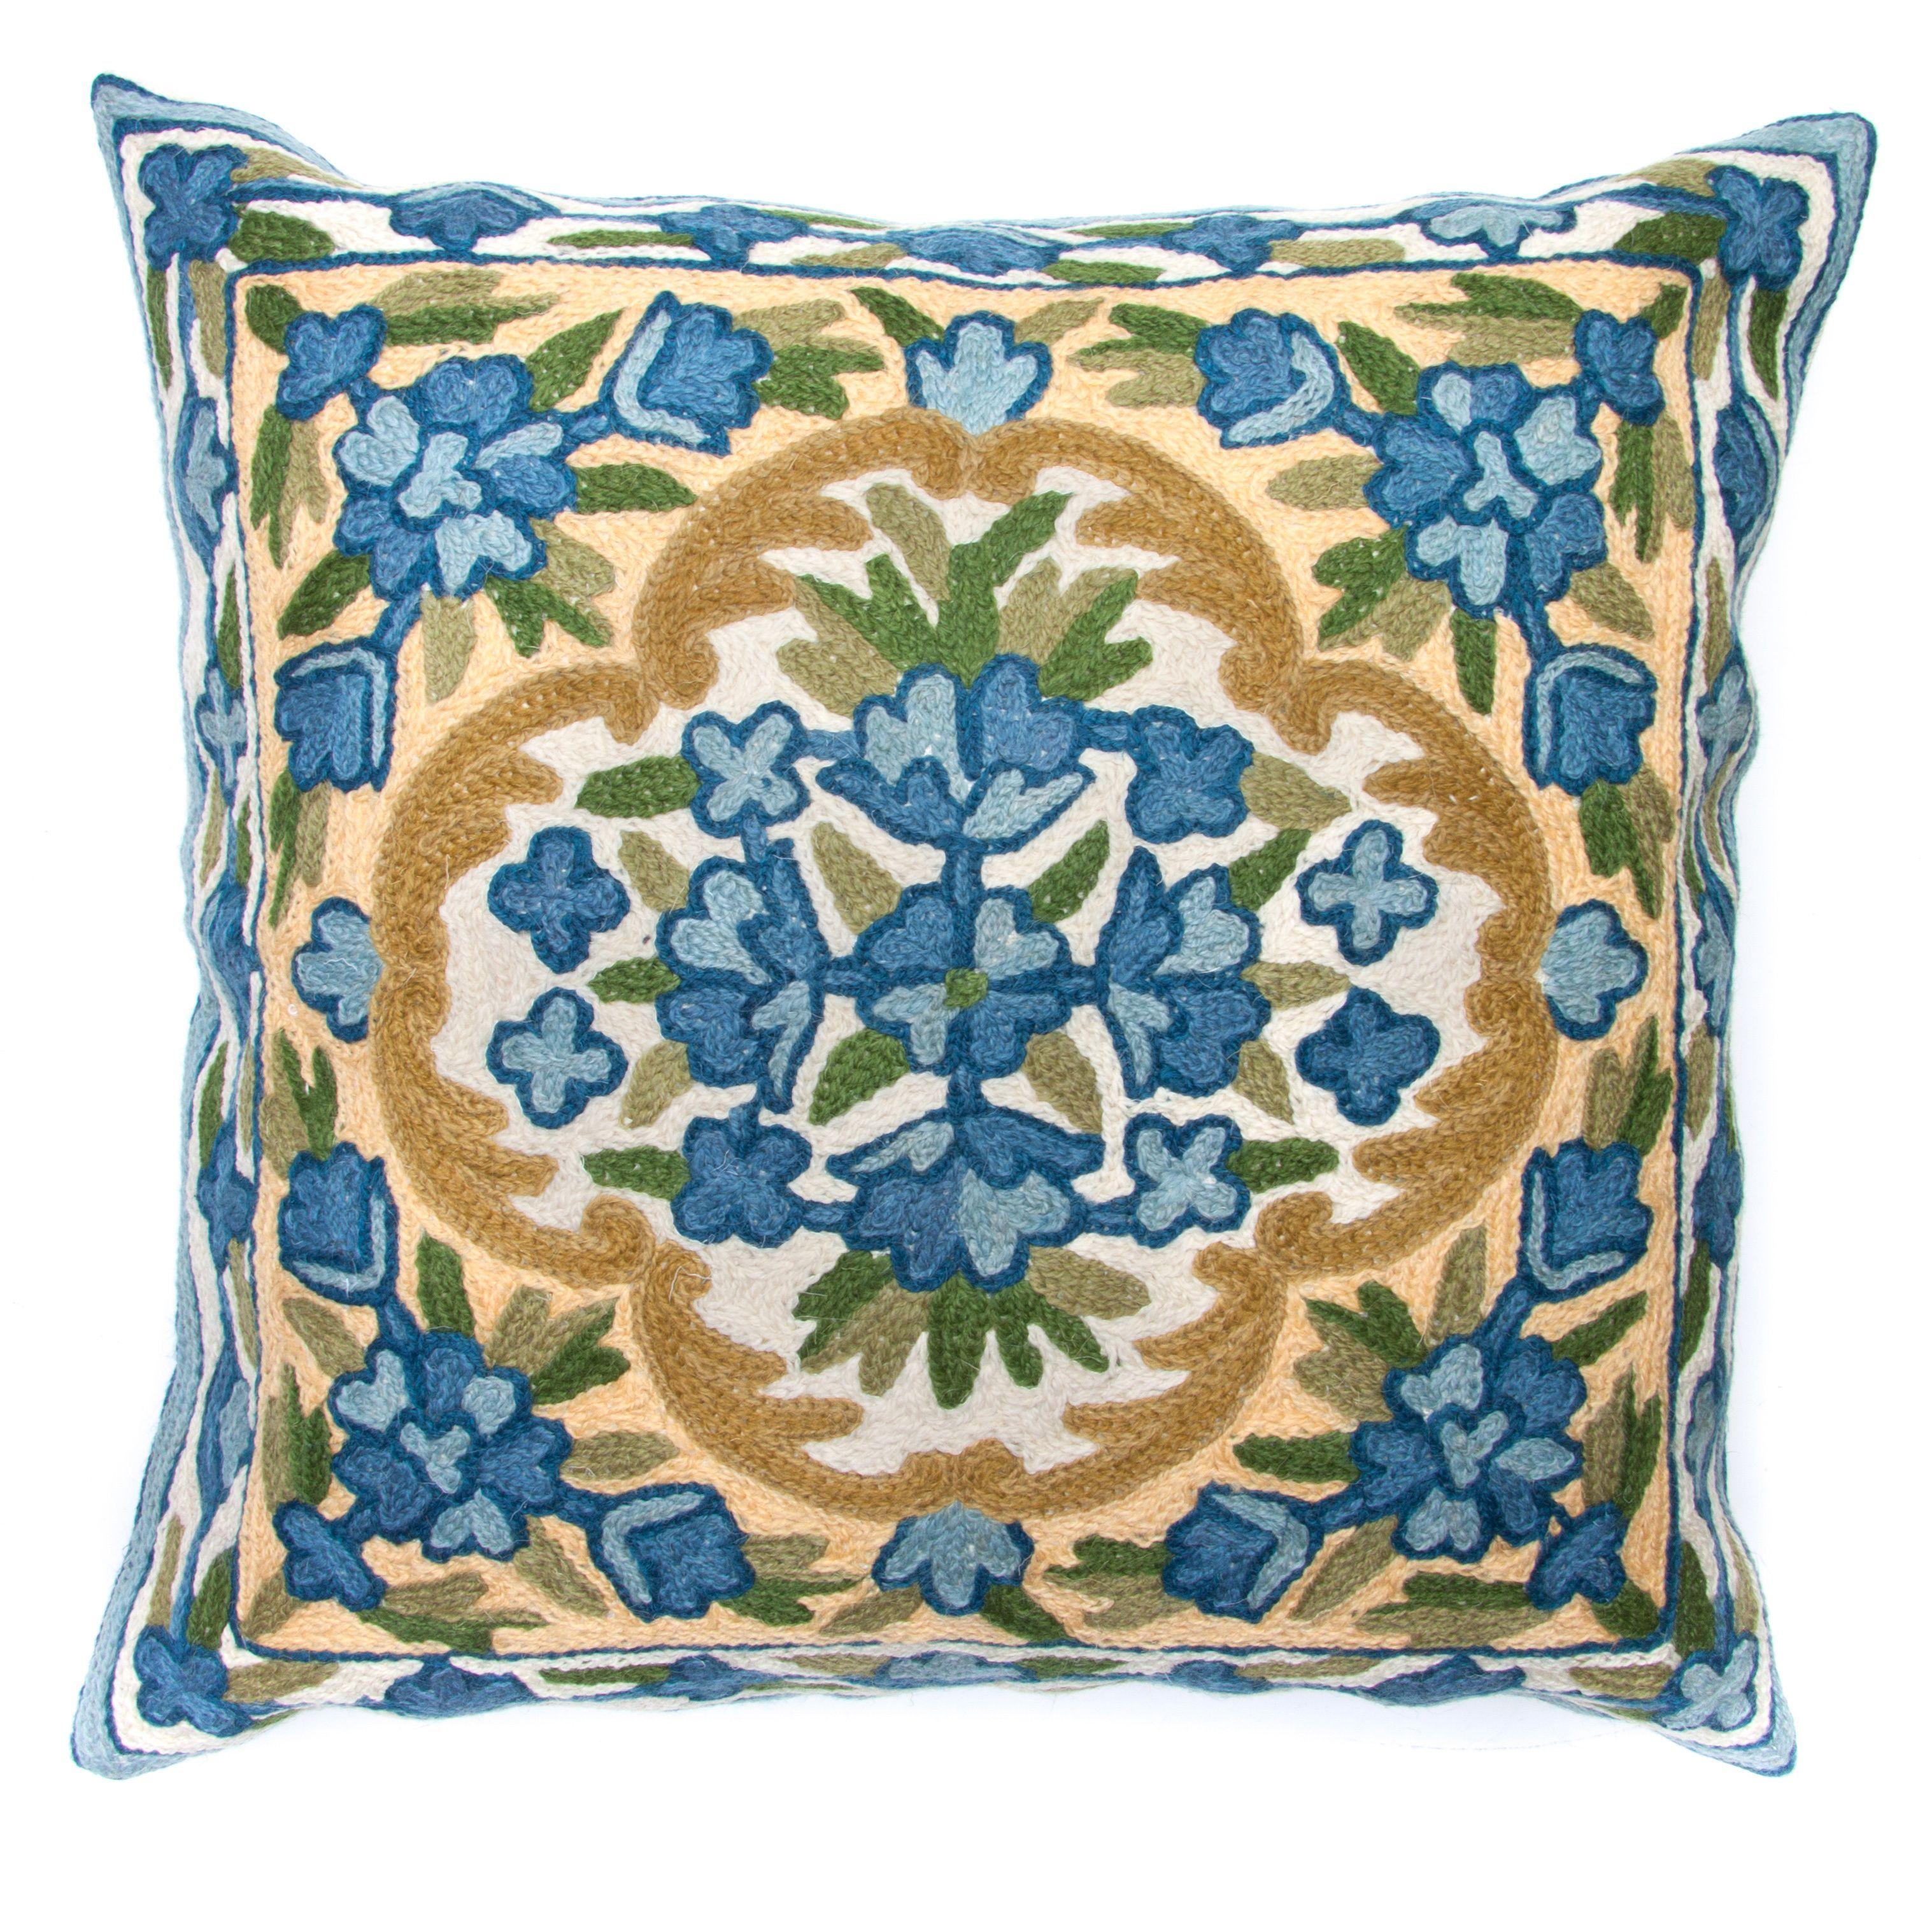 Sitara chain stitch embroidery bell kashmir cushion cover